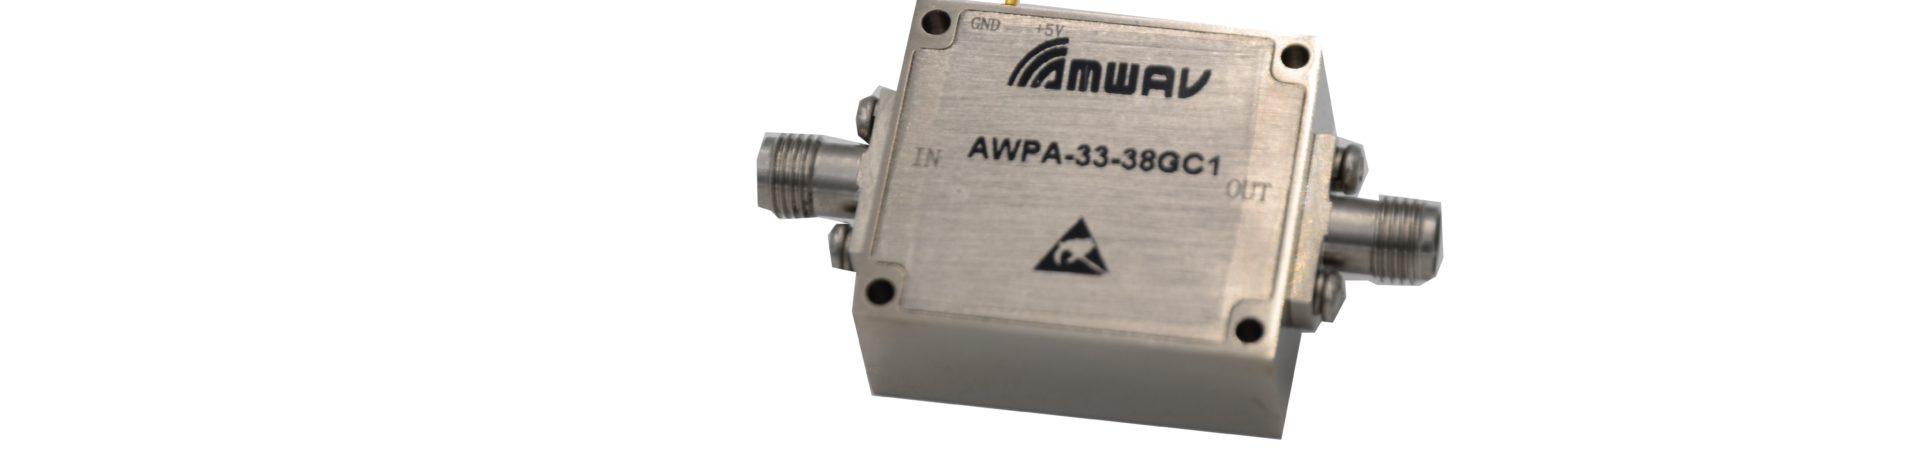 Image AMWAV 1